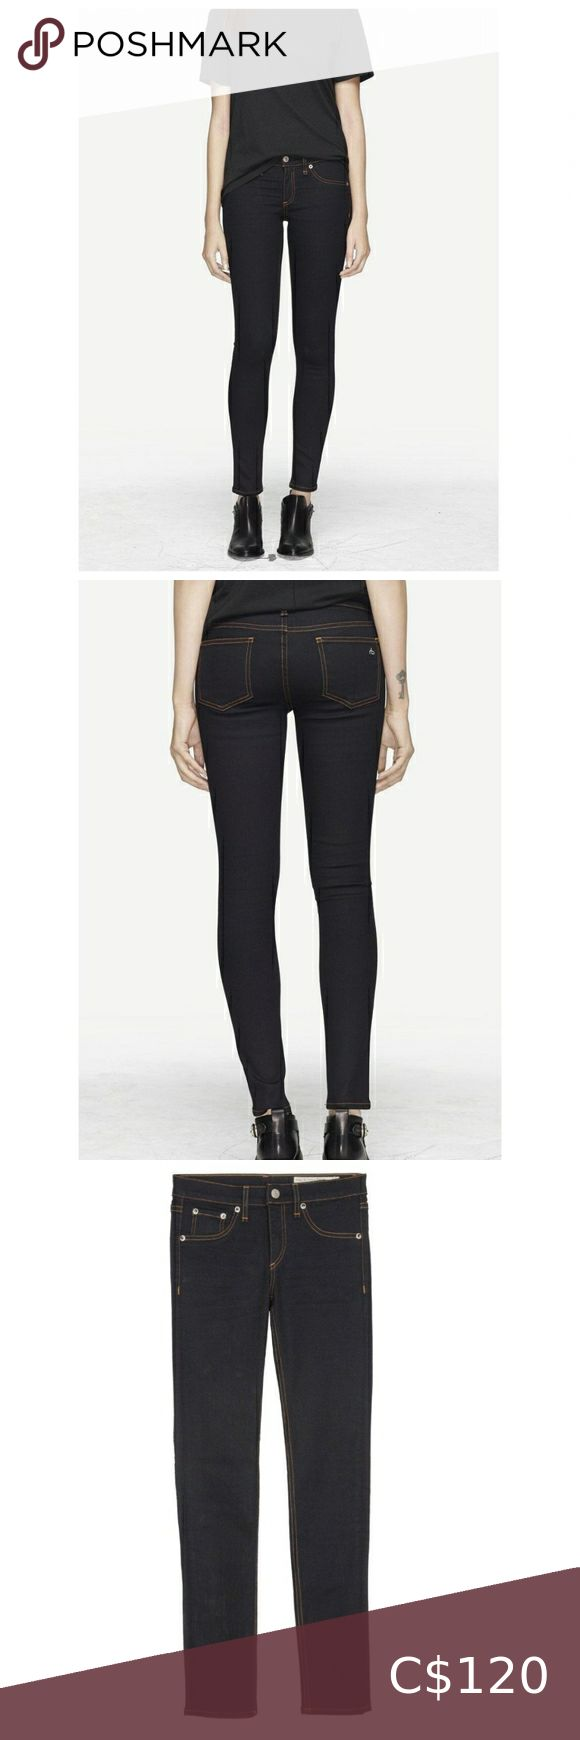 Women Jeans Classic High Waist Denim Skinny Jeans   Women